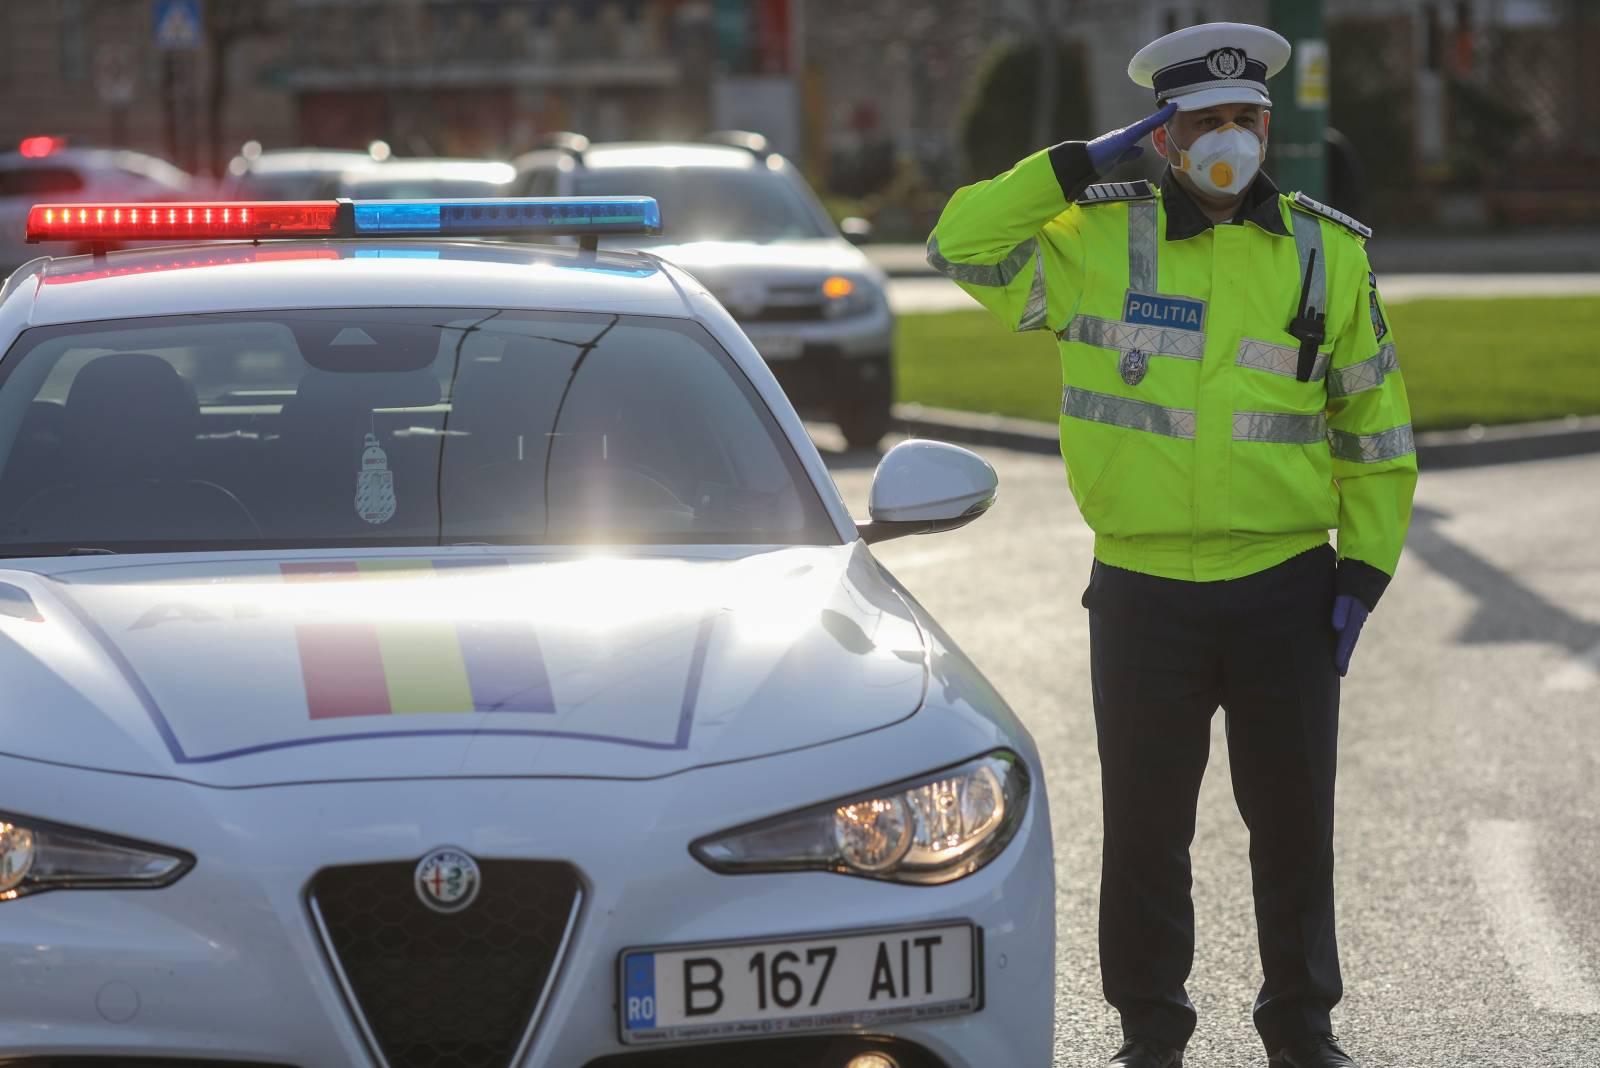 Politia Romana transport persoane varsta